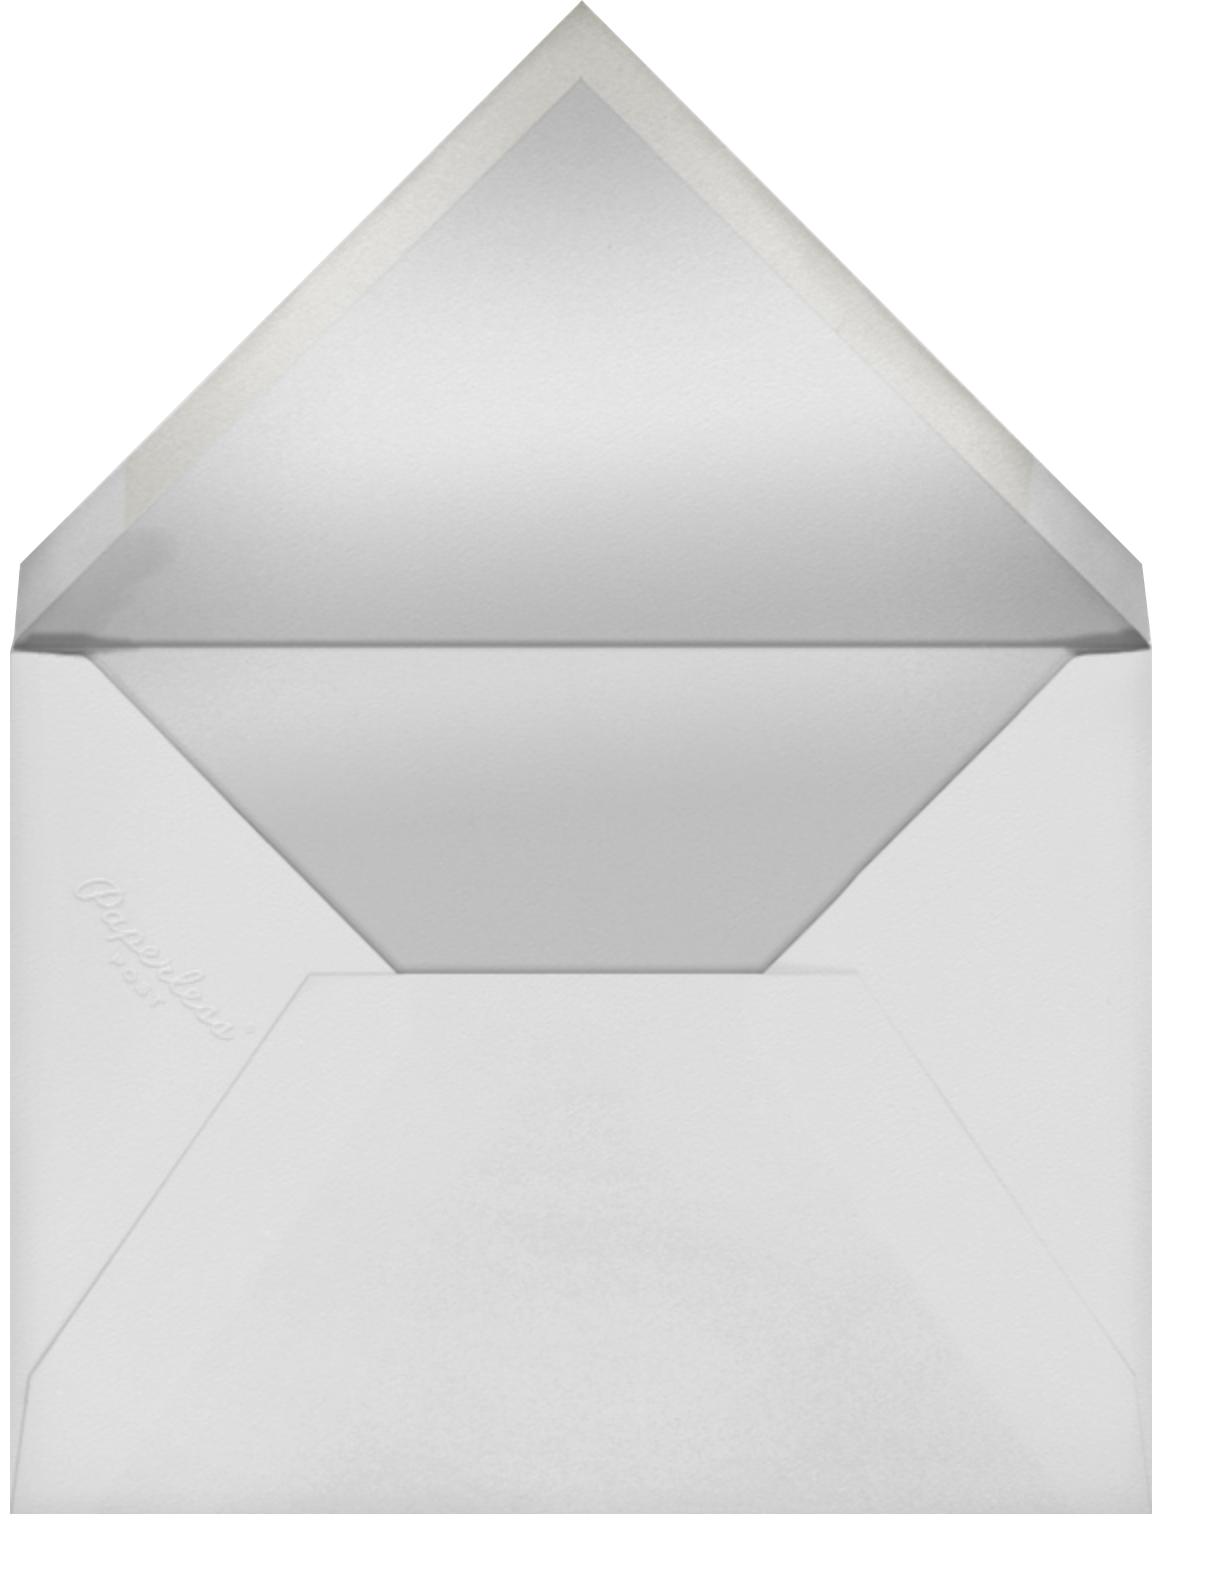 Elizabeth Daylight (Program) - Liberty - Menus - envelope back